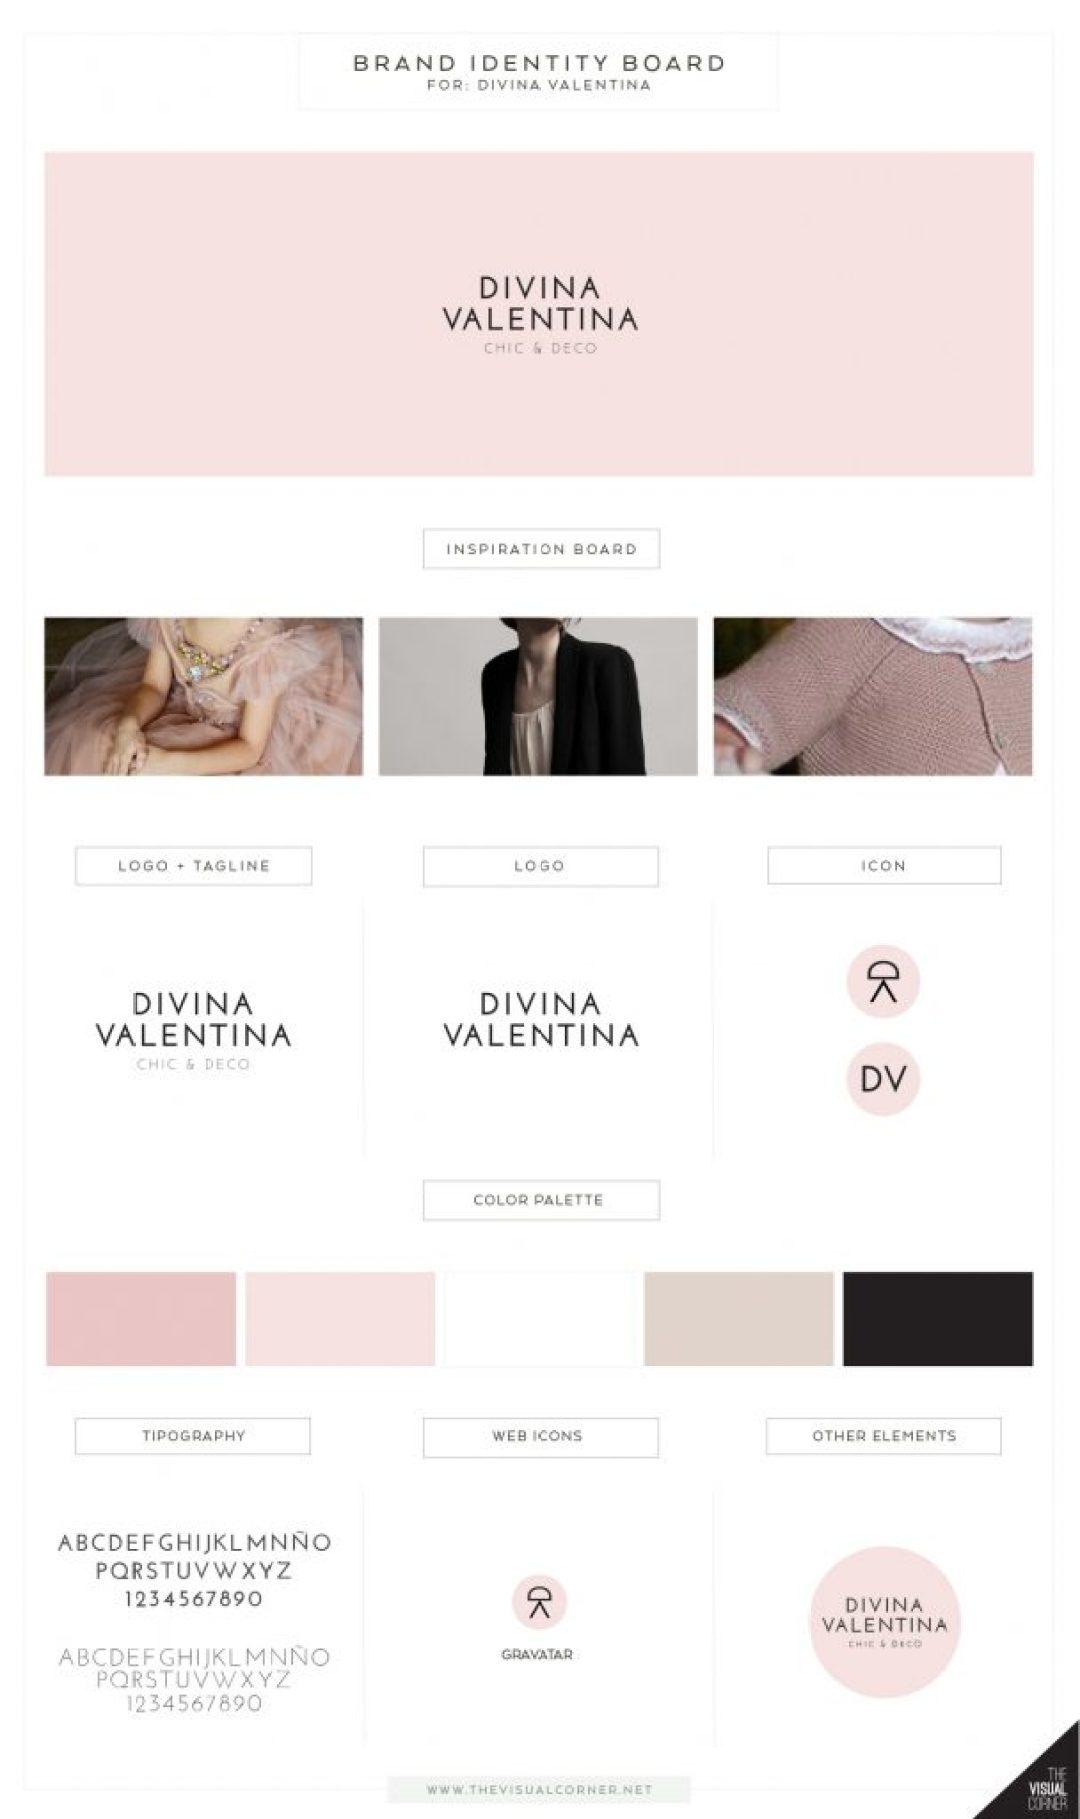 Brand identity for Divina Valentina boutique by The Visual Corner studio